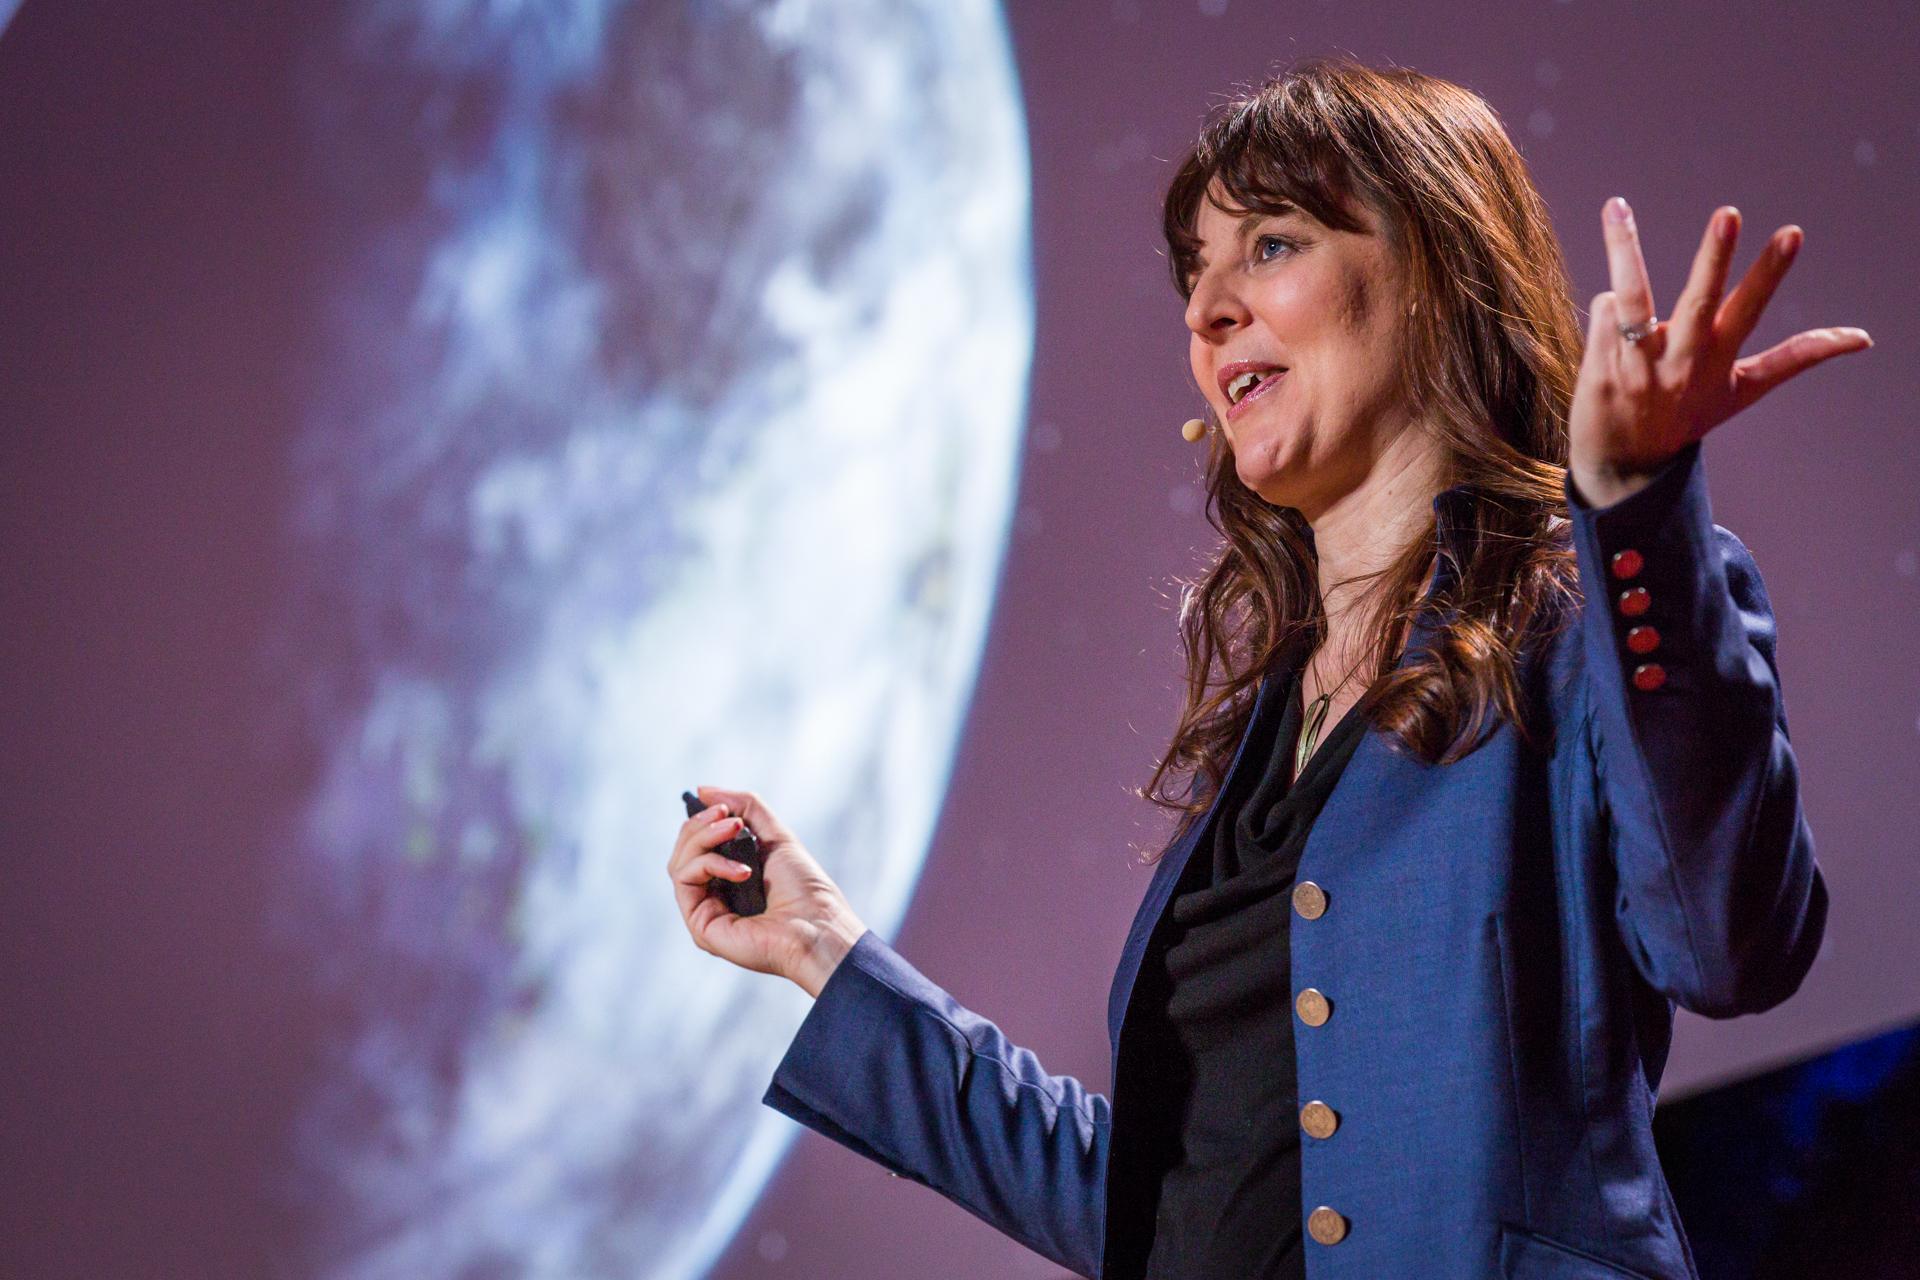 Lisa Kaltenegger speaks at TEDYouth, November 15, 2014, Session 1, Brooklyn Museum, Brooklyn, NY.  Photo: Ryan Lash/TED